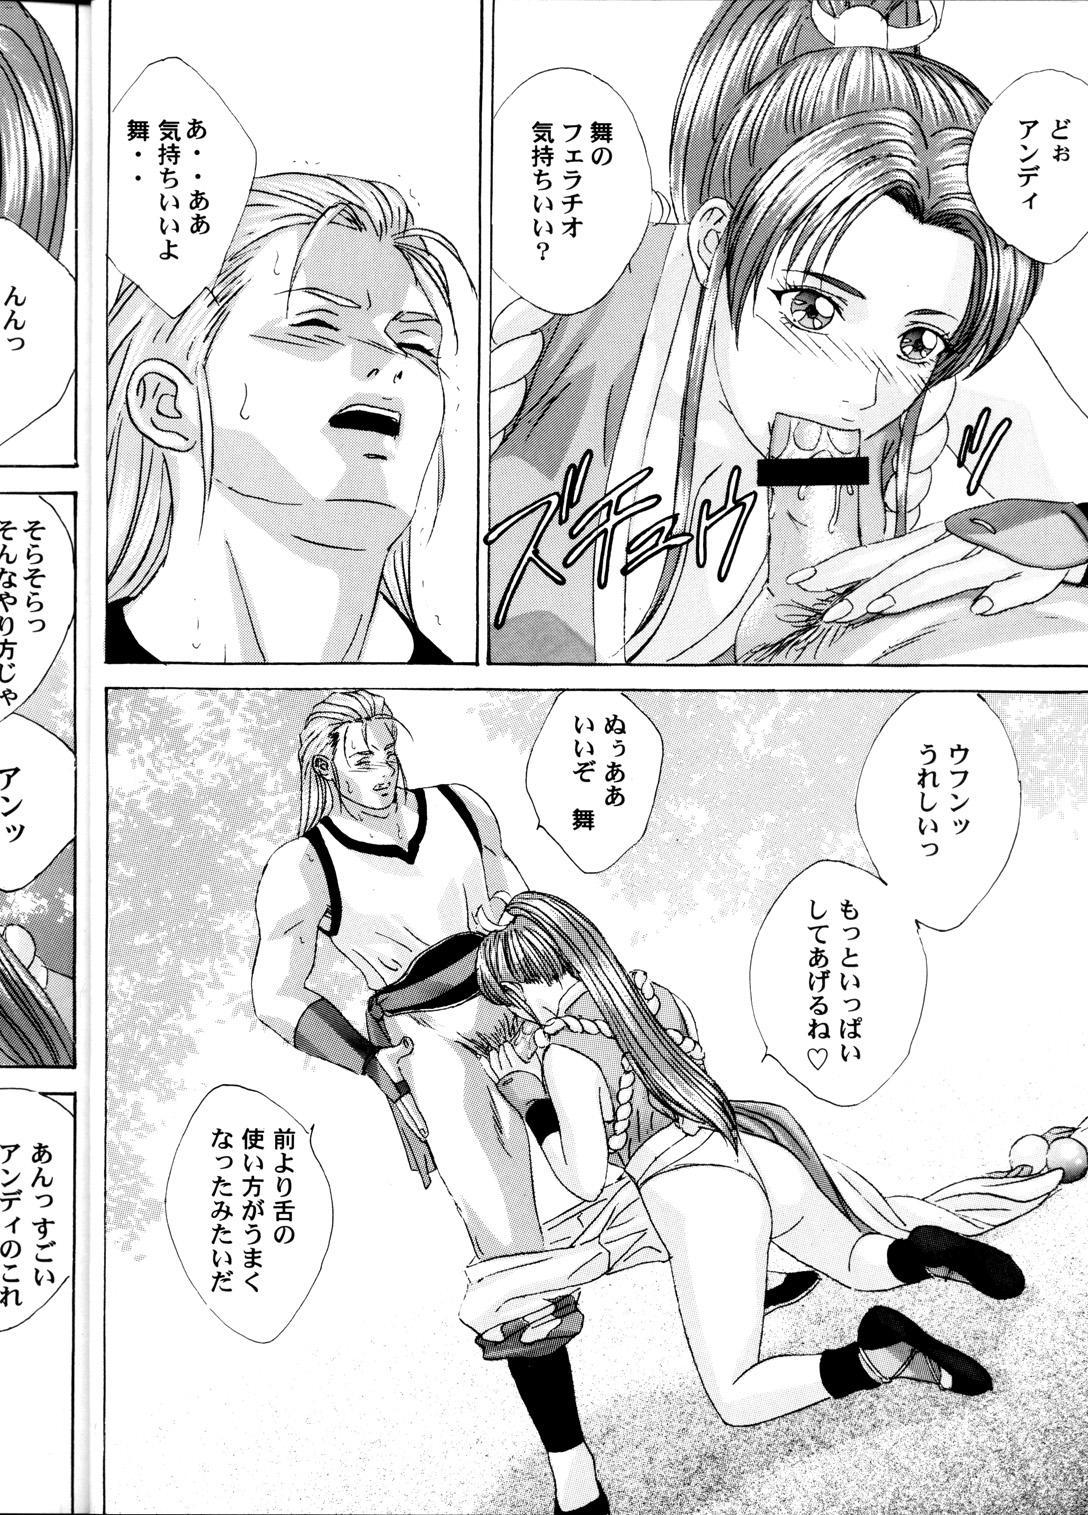 (C60) [D-LOVERS (Nishimaki Tohru)] Mai -Innyuuden- Daiichigou (King of Fighters) 8